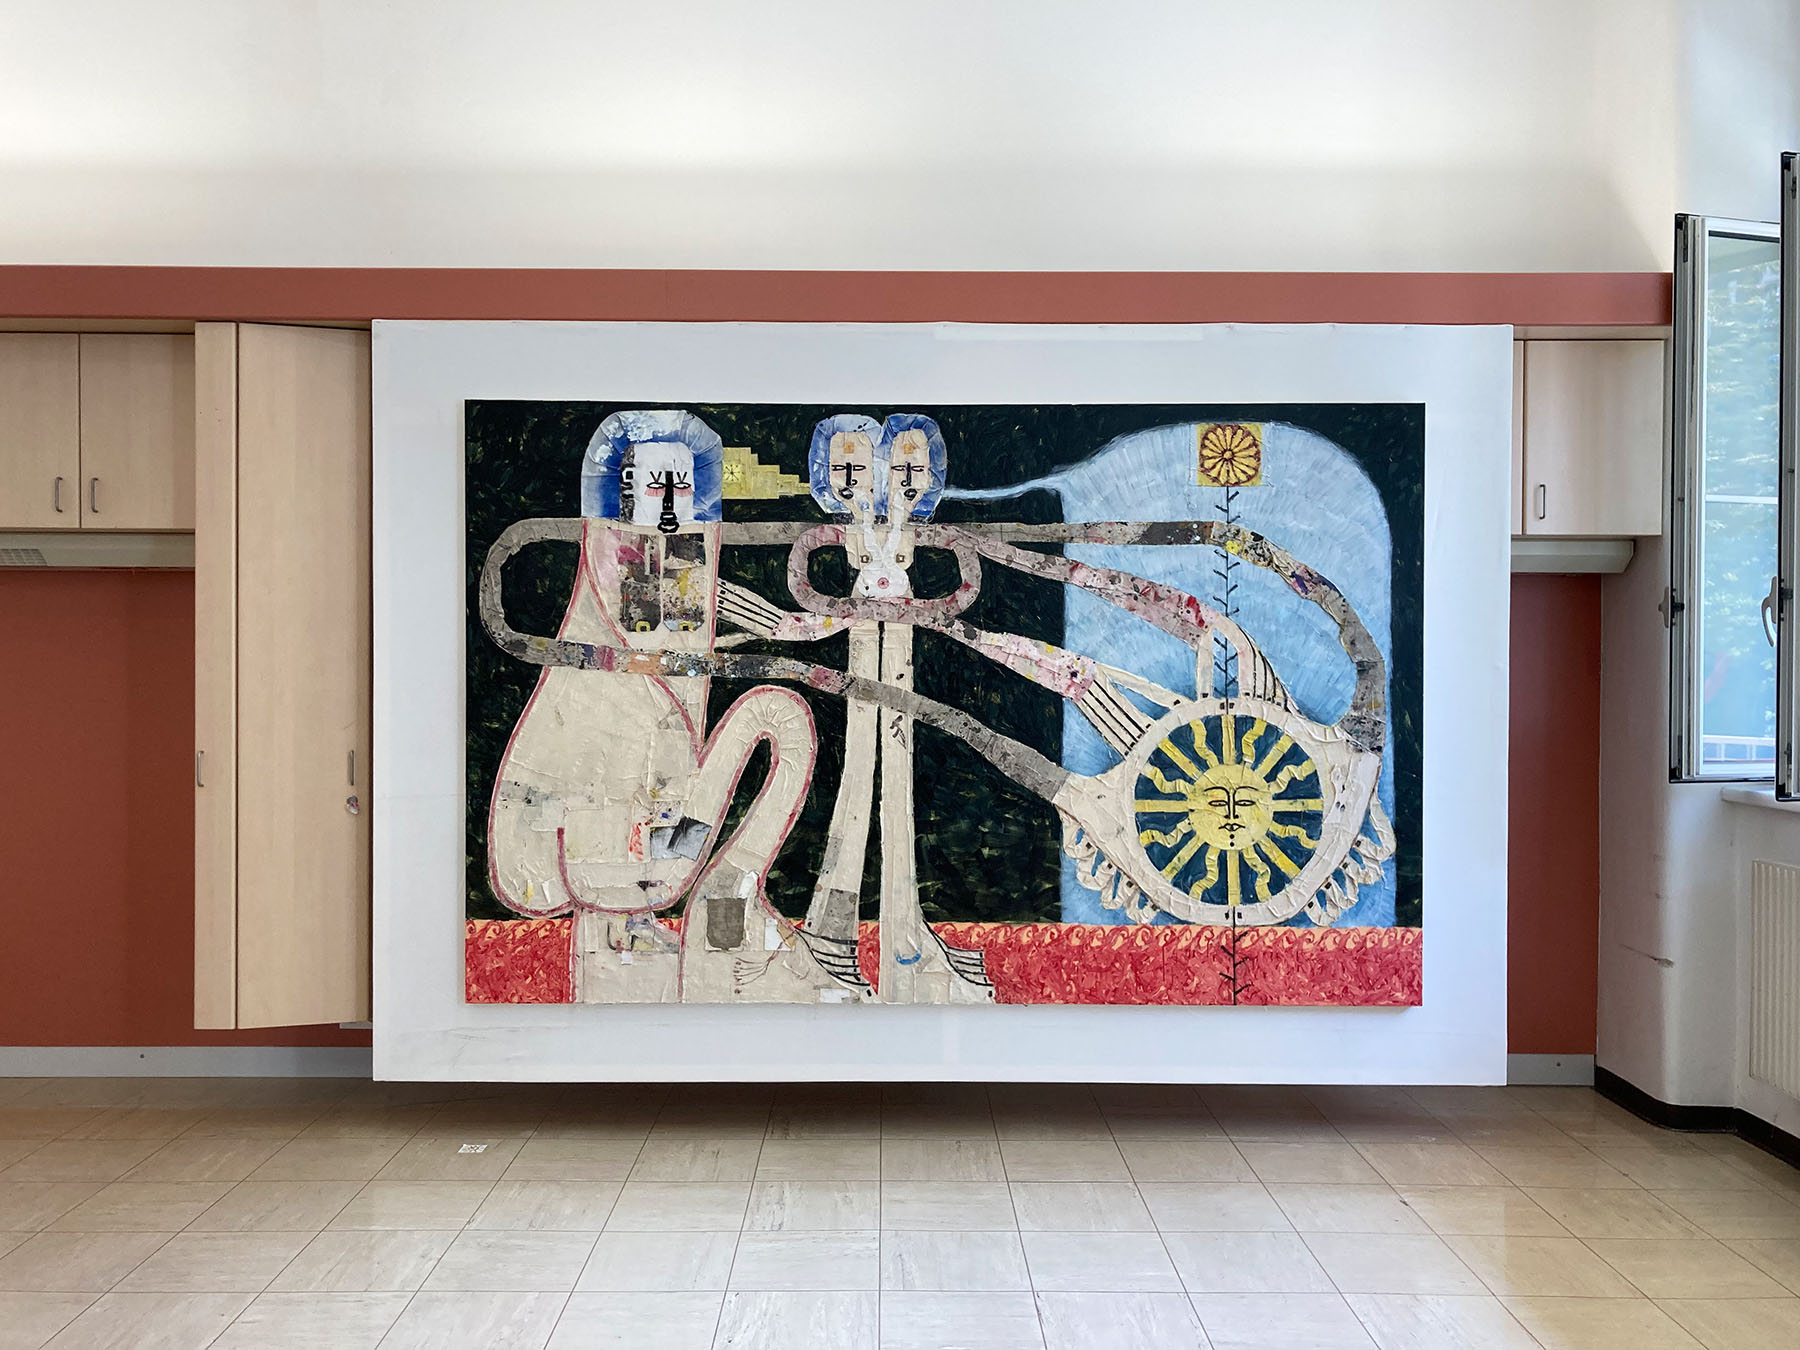 adrian hazi, elektrohalle rhomberg, gallery statement, germany, parallel art fair